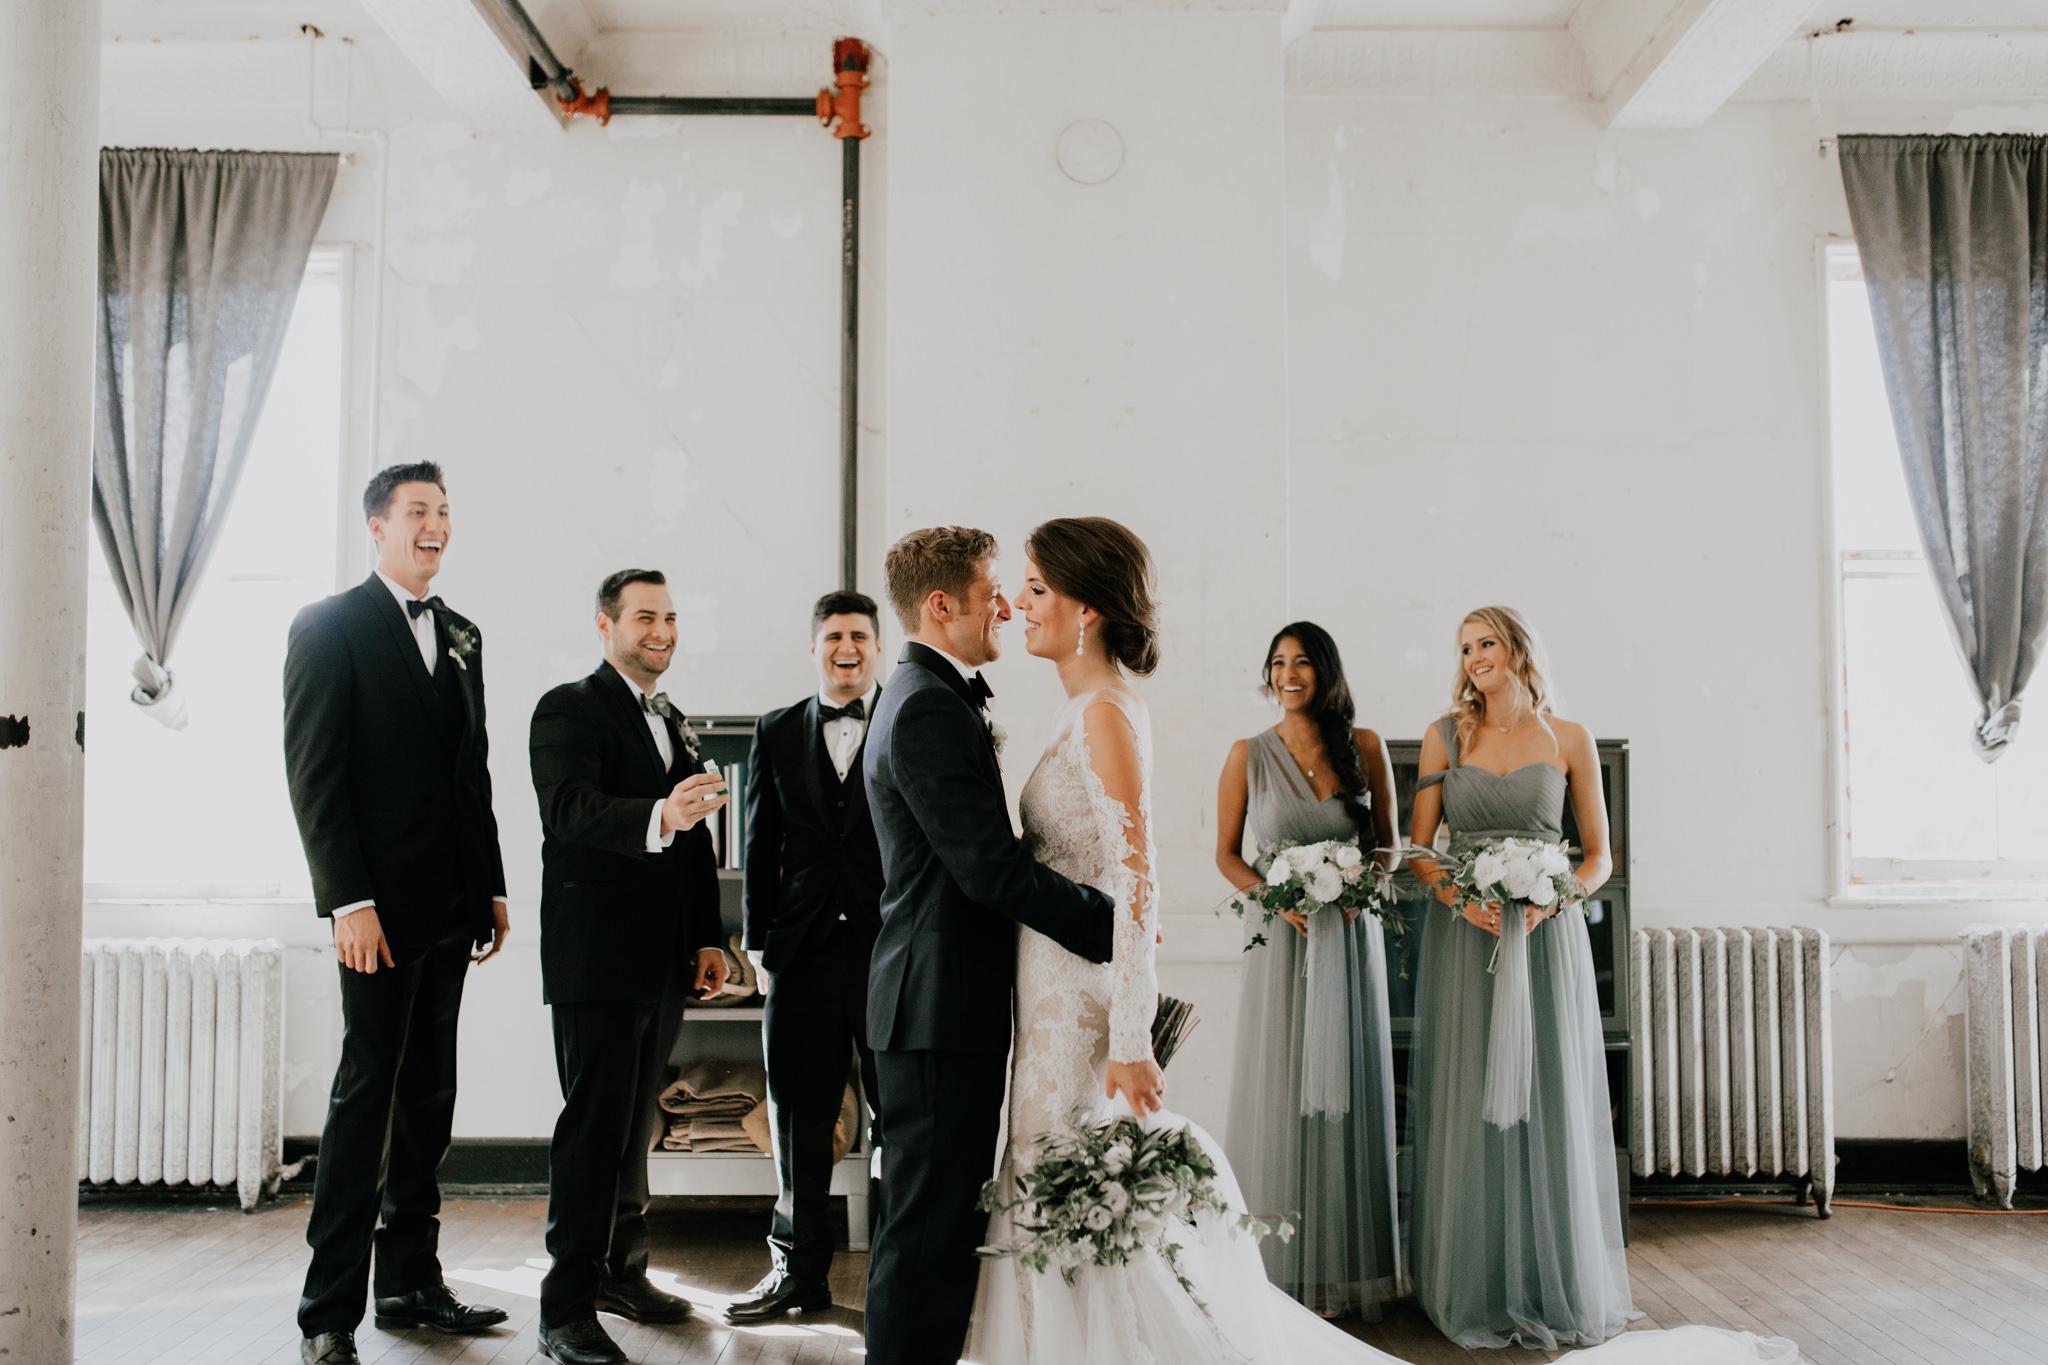 wedding-headlands-center-for-the-arts-sausalito-45.jpg